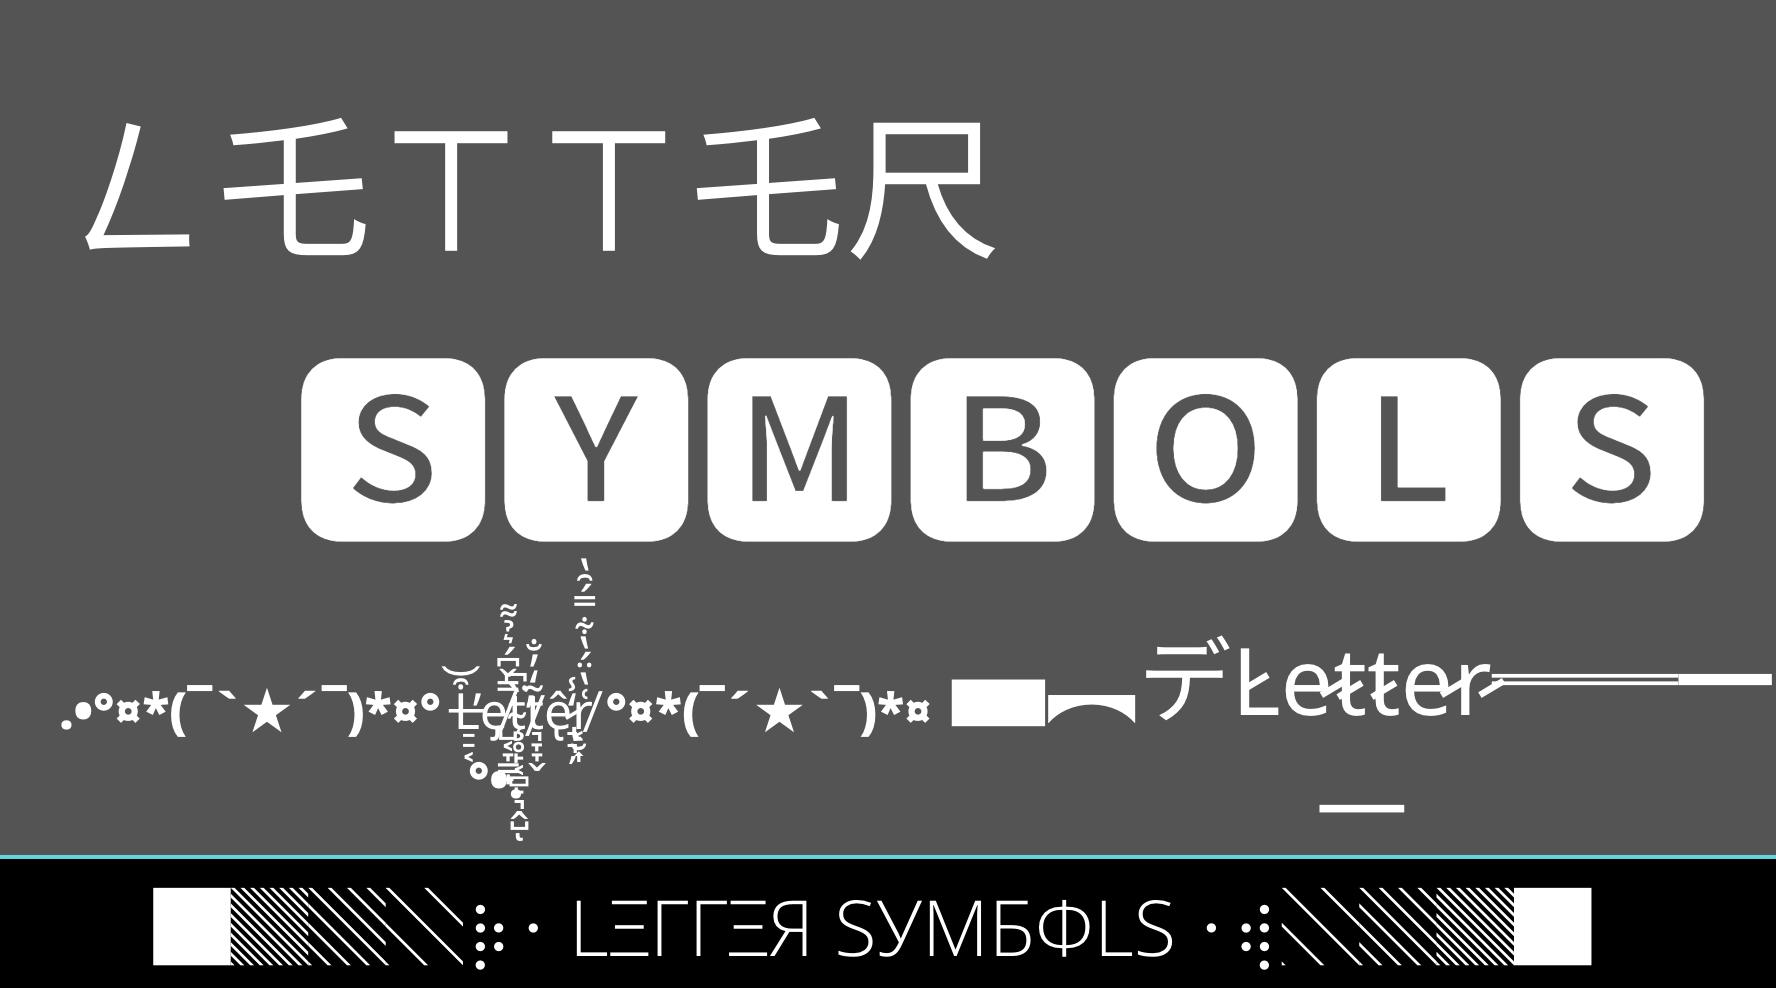 Letter Symbols - 𝕃𝕖𝕥𝕥𝕖𝕣 𝕊𝕪𝕞𝕓𝕠𝕝𝕤 FREE Unlimited